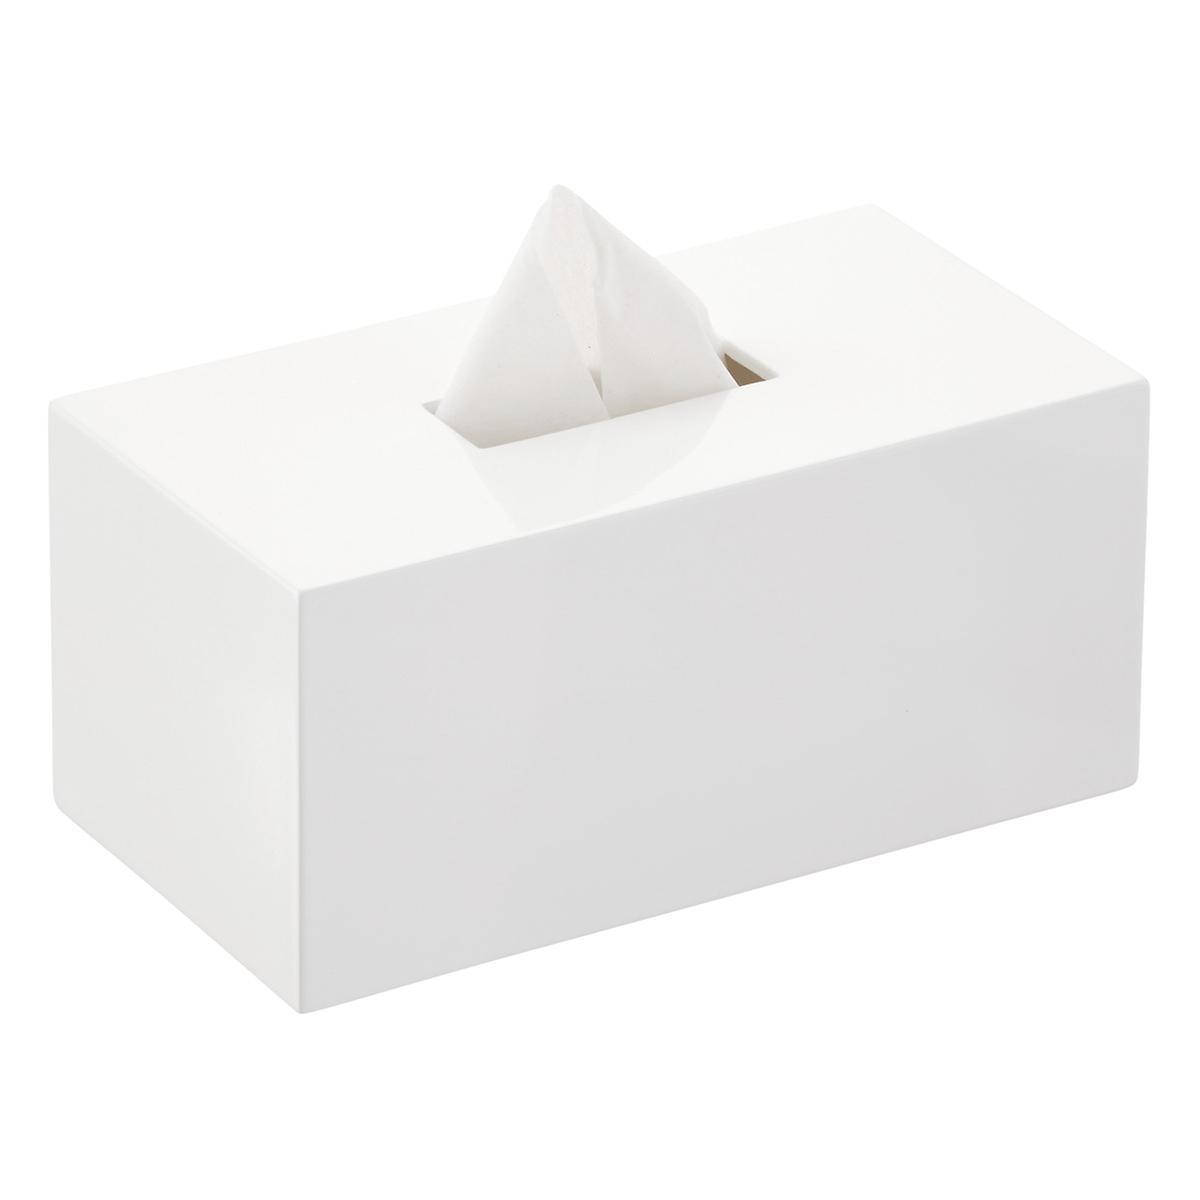 Lacquered Rectangular Tissue Box Cover